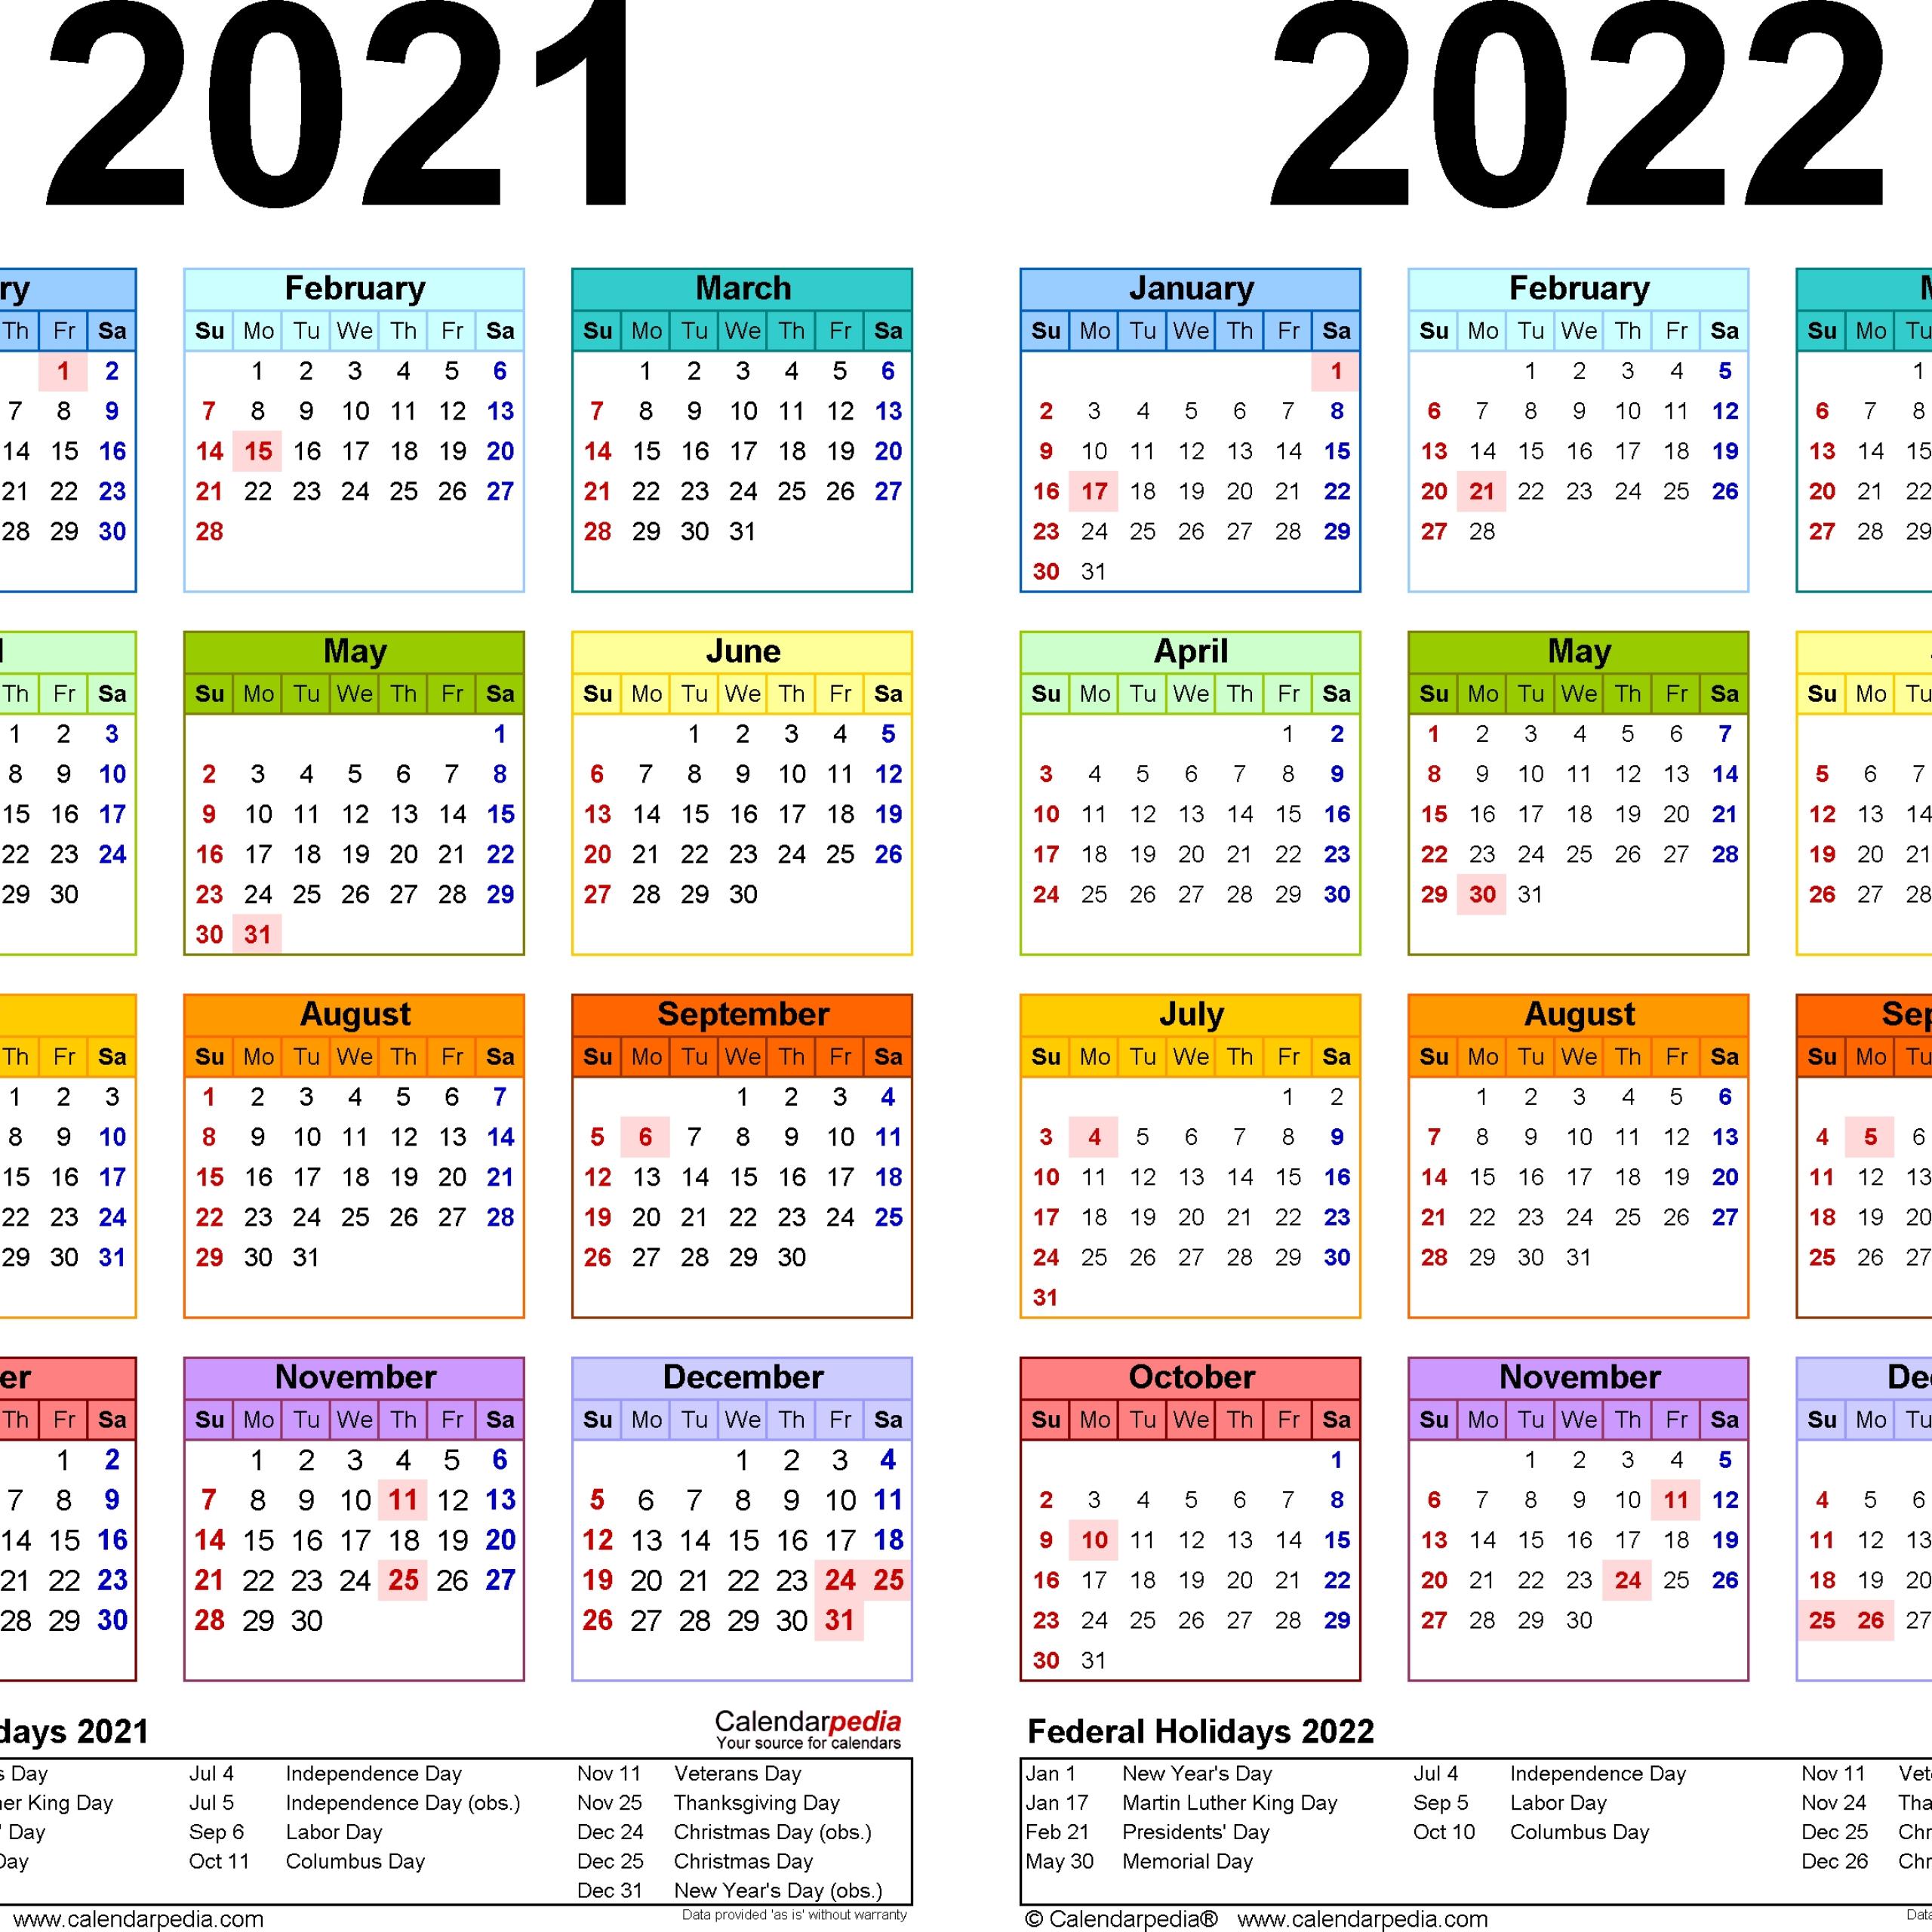 2021 Calendar South Africa | Get Free Calendar with regard to Billings School District 2 Calendar For 2021-2022